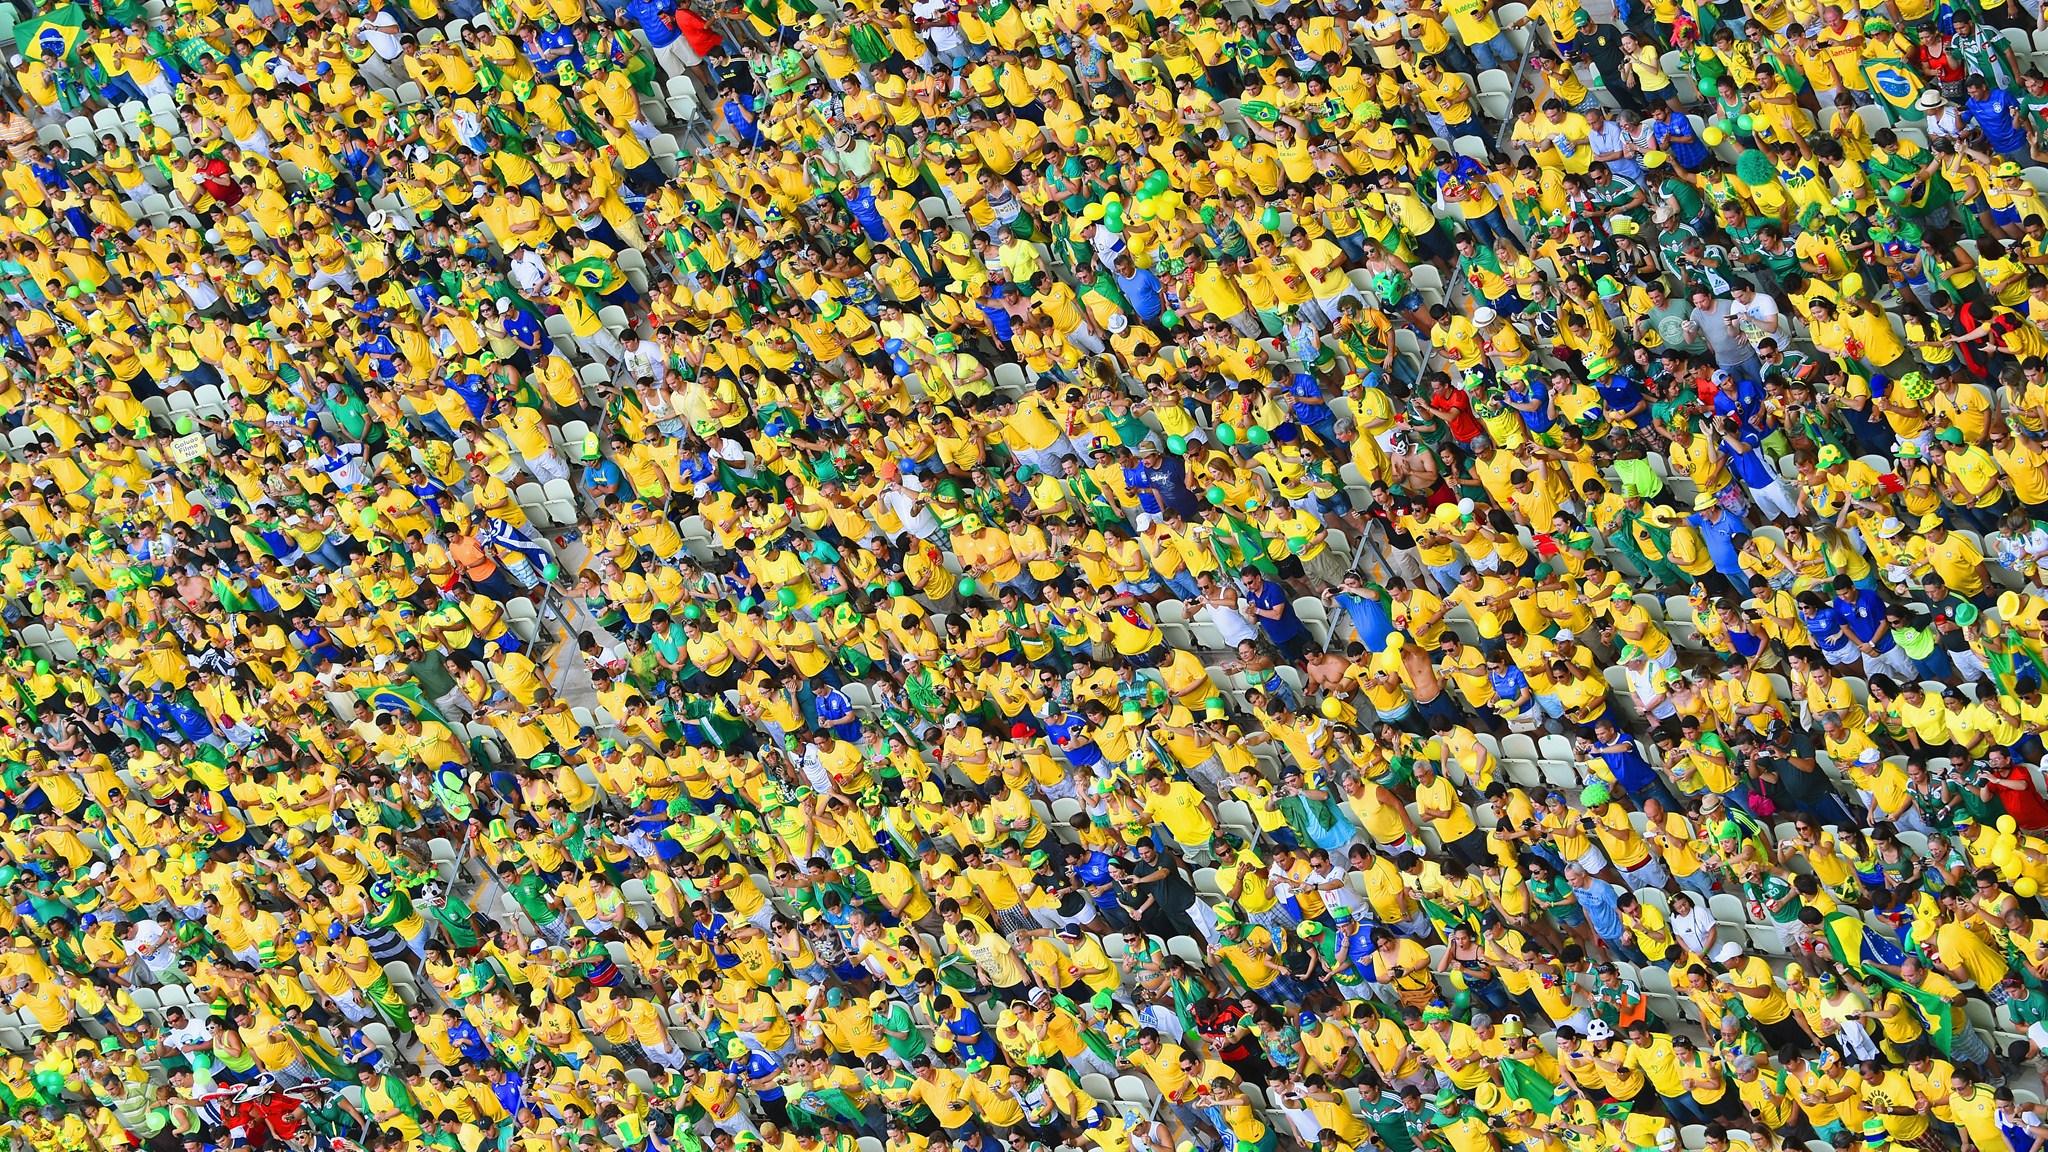 119 - Brazil-Mexico [0-0] -- 17 Jun 2014 - 16-00 -- Fortaleza - Estadio Castelao - kuaza